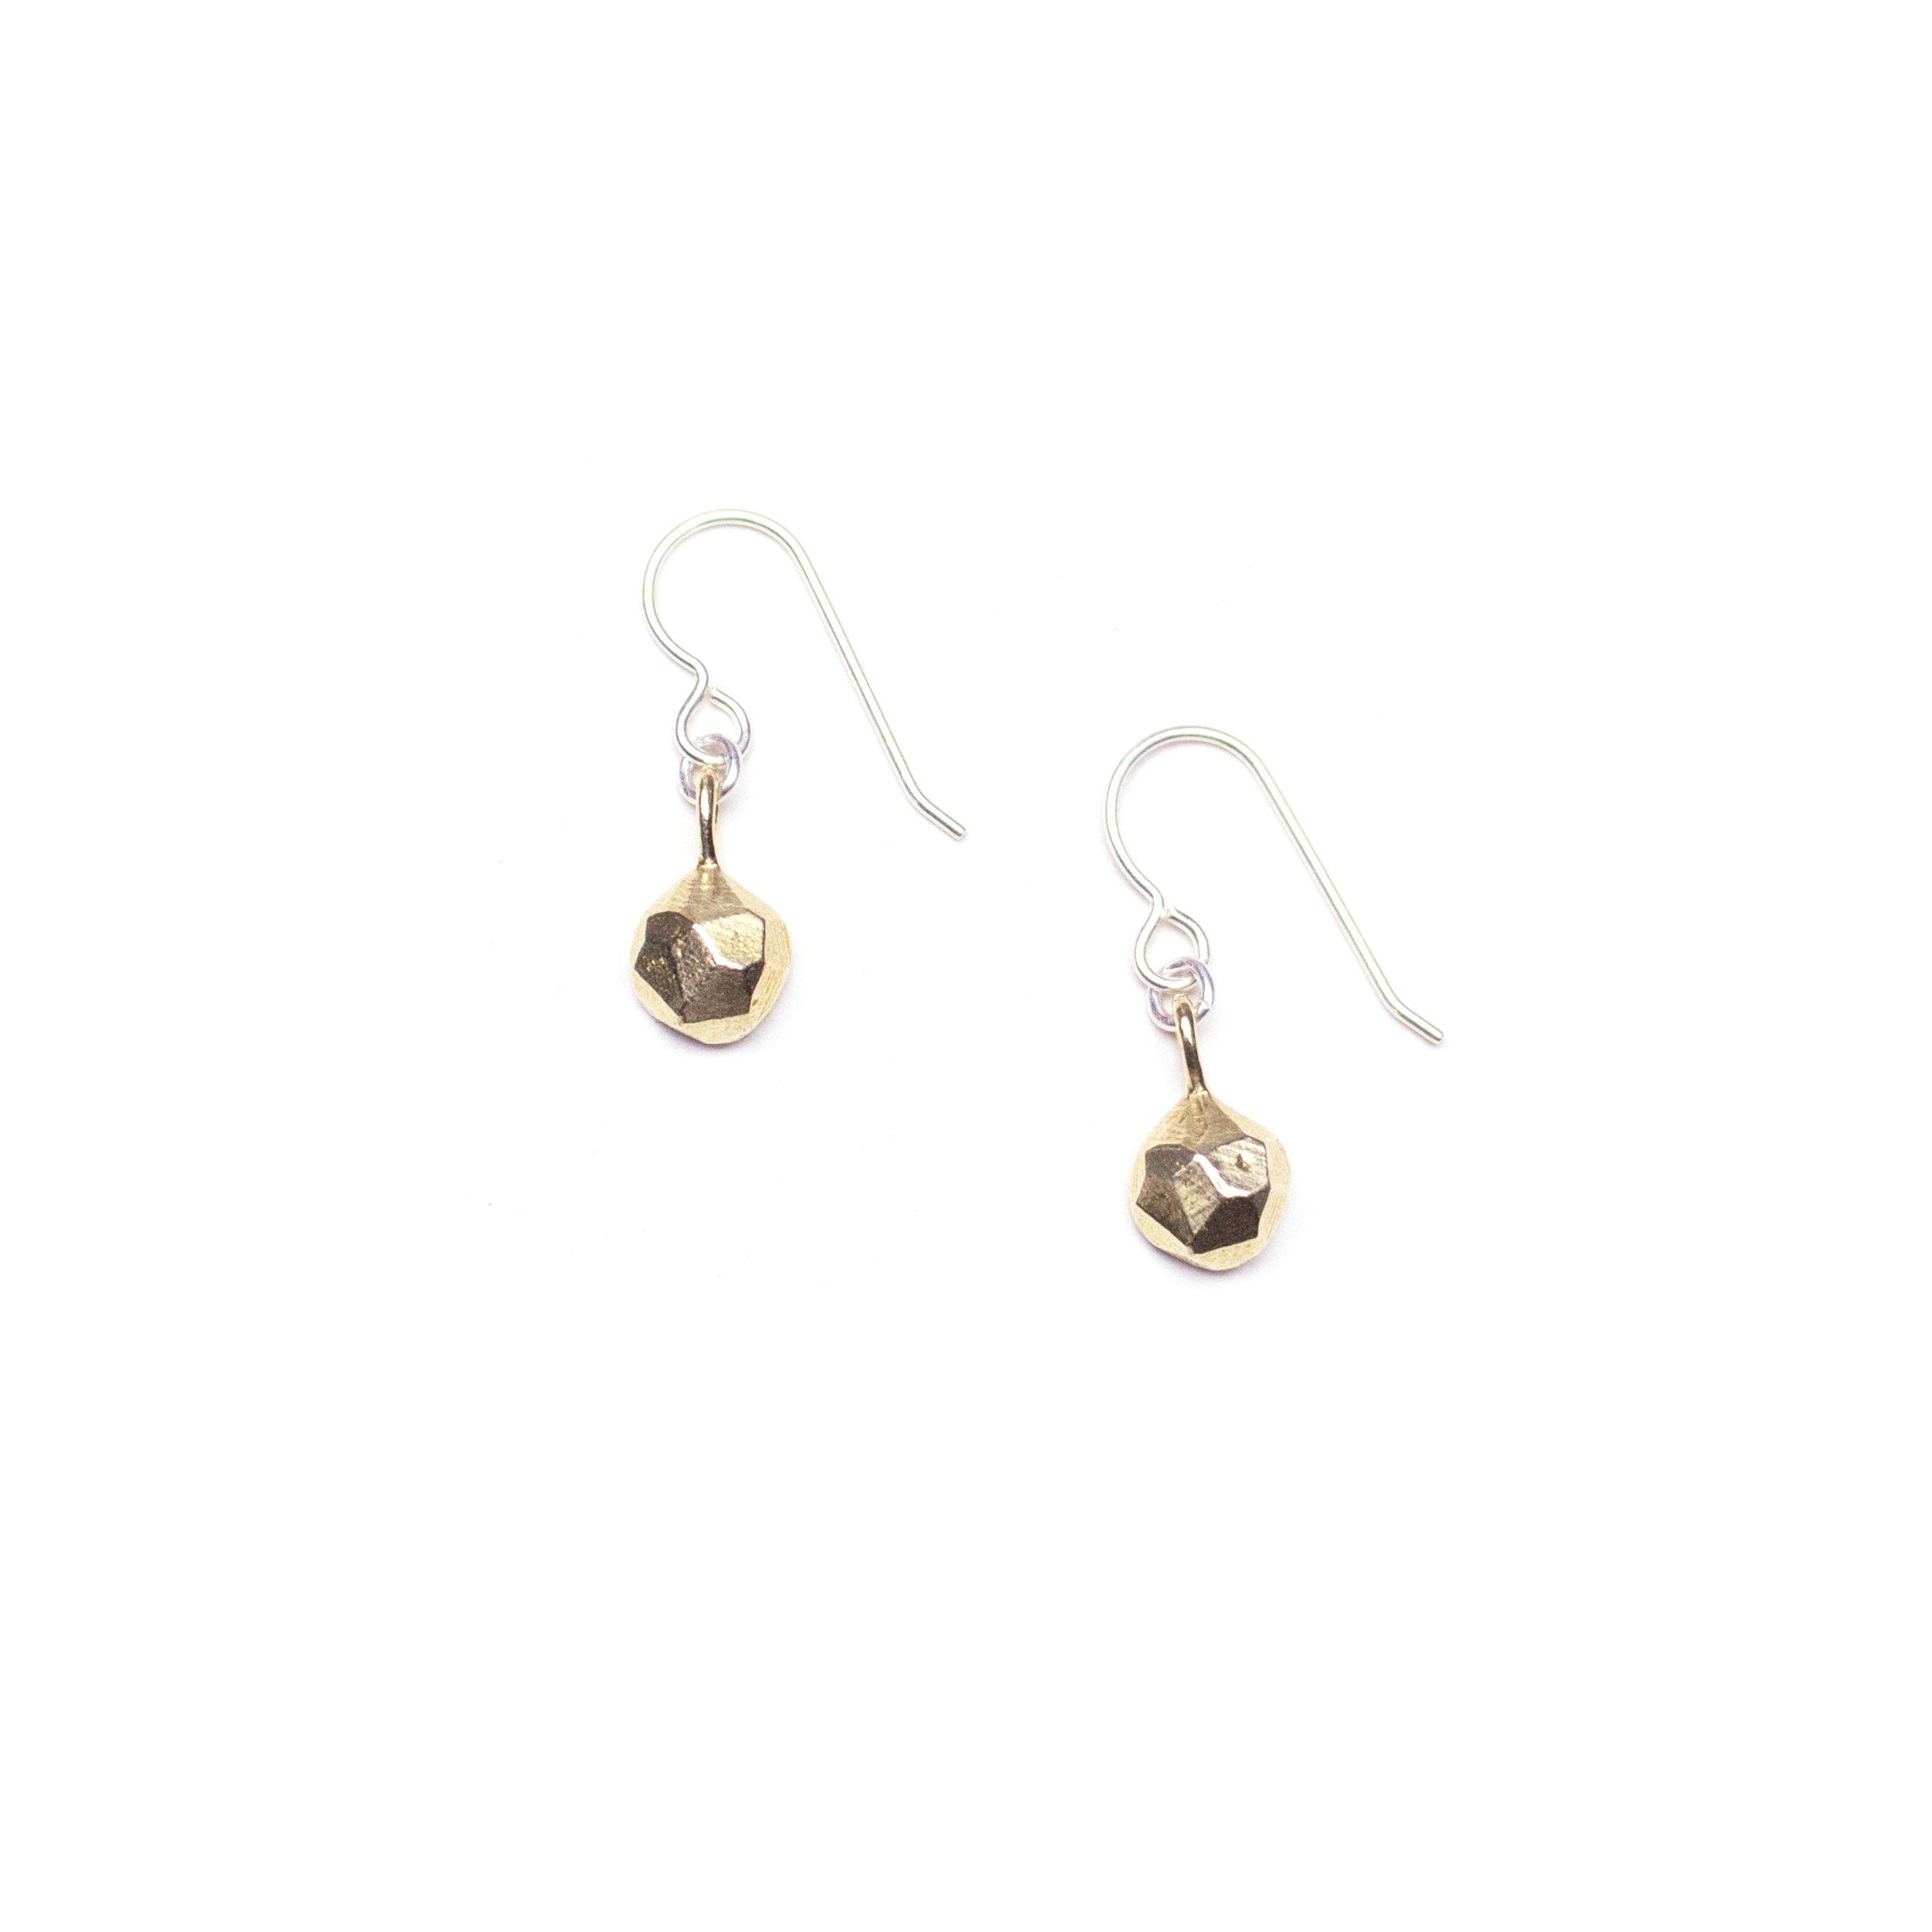 007-Brass-Raw-Hemisphere-Earrings-Ethical-Jewelry-Bay-Area-Olivia-Shih.jpg